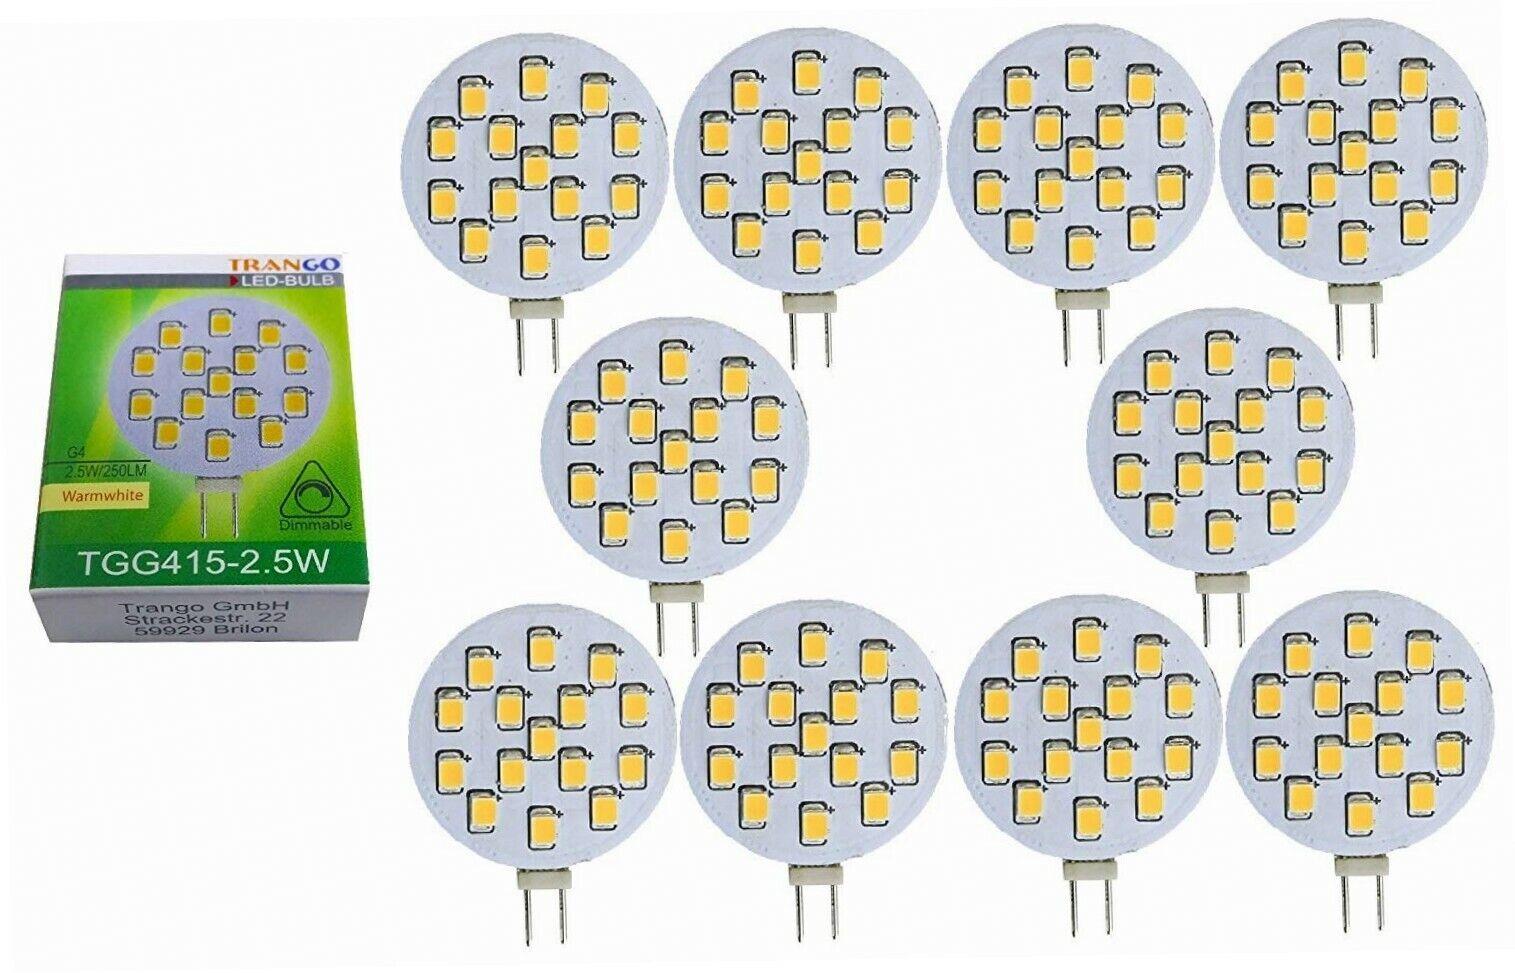 10 x Trango LED Leuchtmittel dimmbar G4 12V AC DC ca. 2.5 Watt warmweiss...